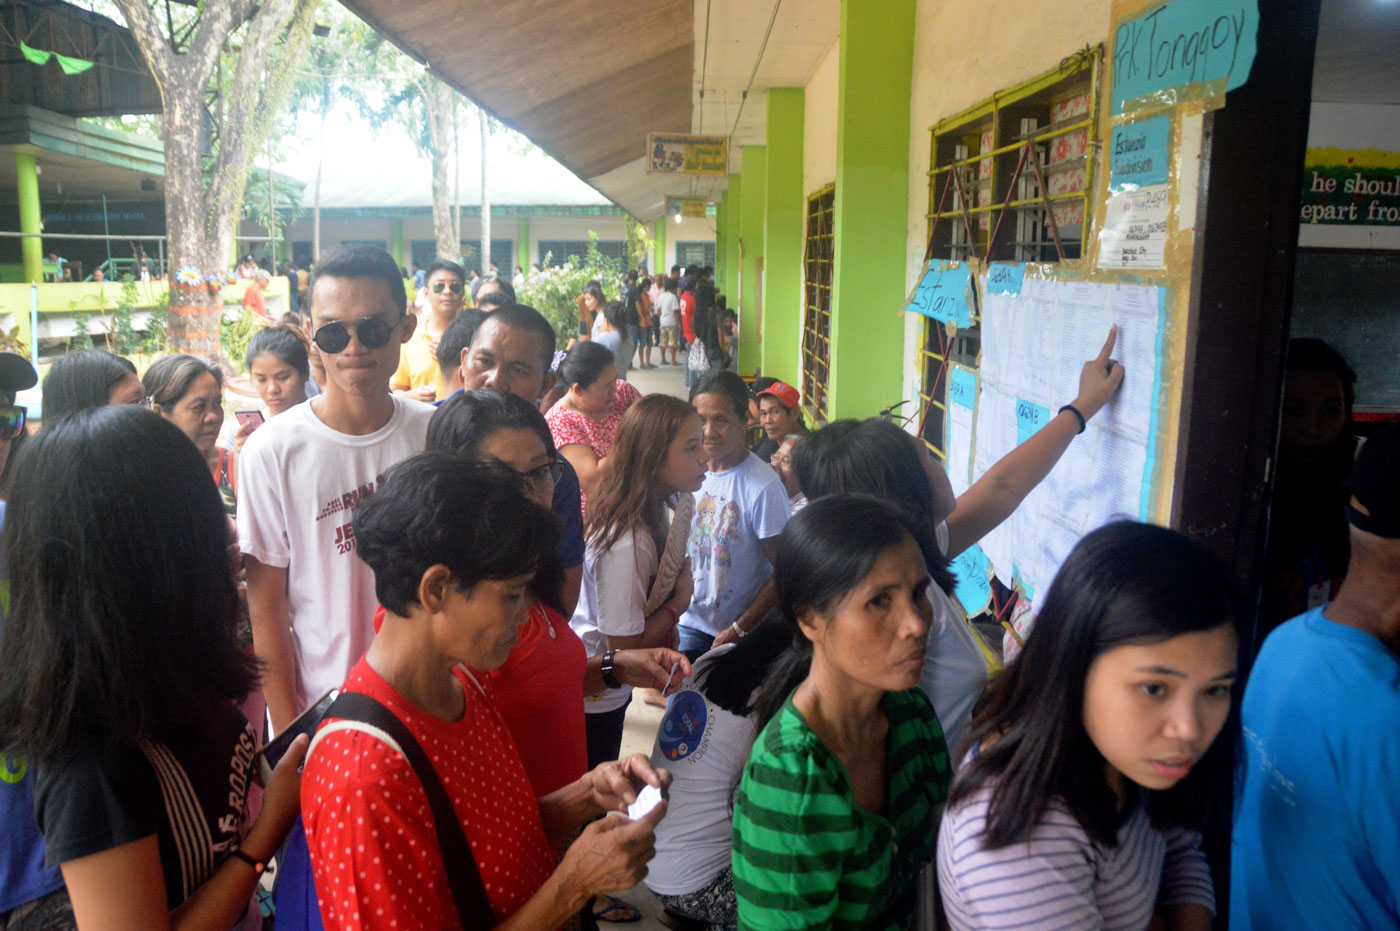 RESIDENTS of Barangay Mandalagan, Bacolod City, cast their votes at Mandalagan Elementary School. Photo by Marchel P. Espina/Rappler